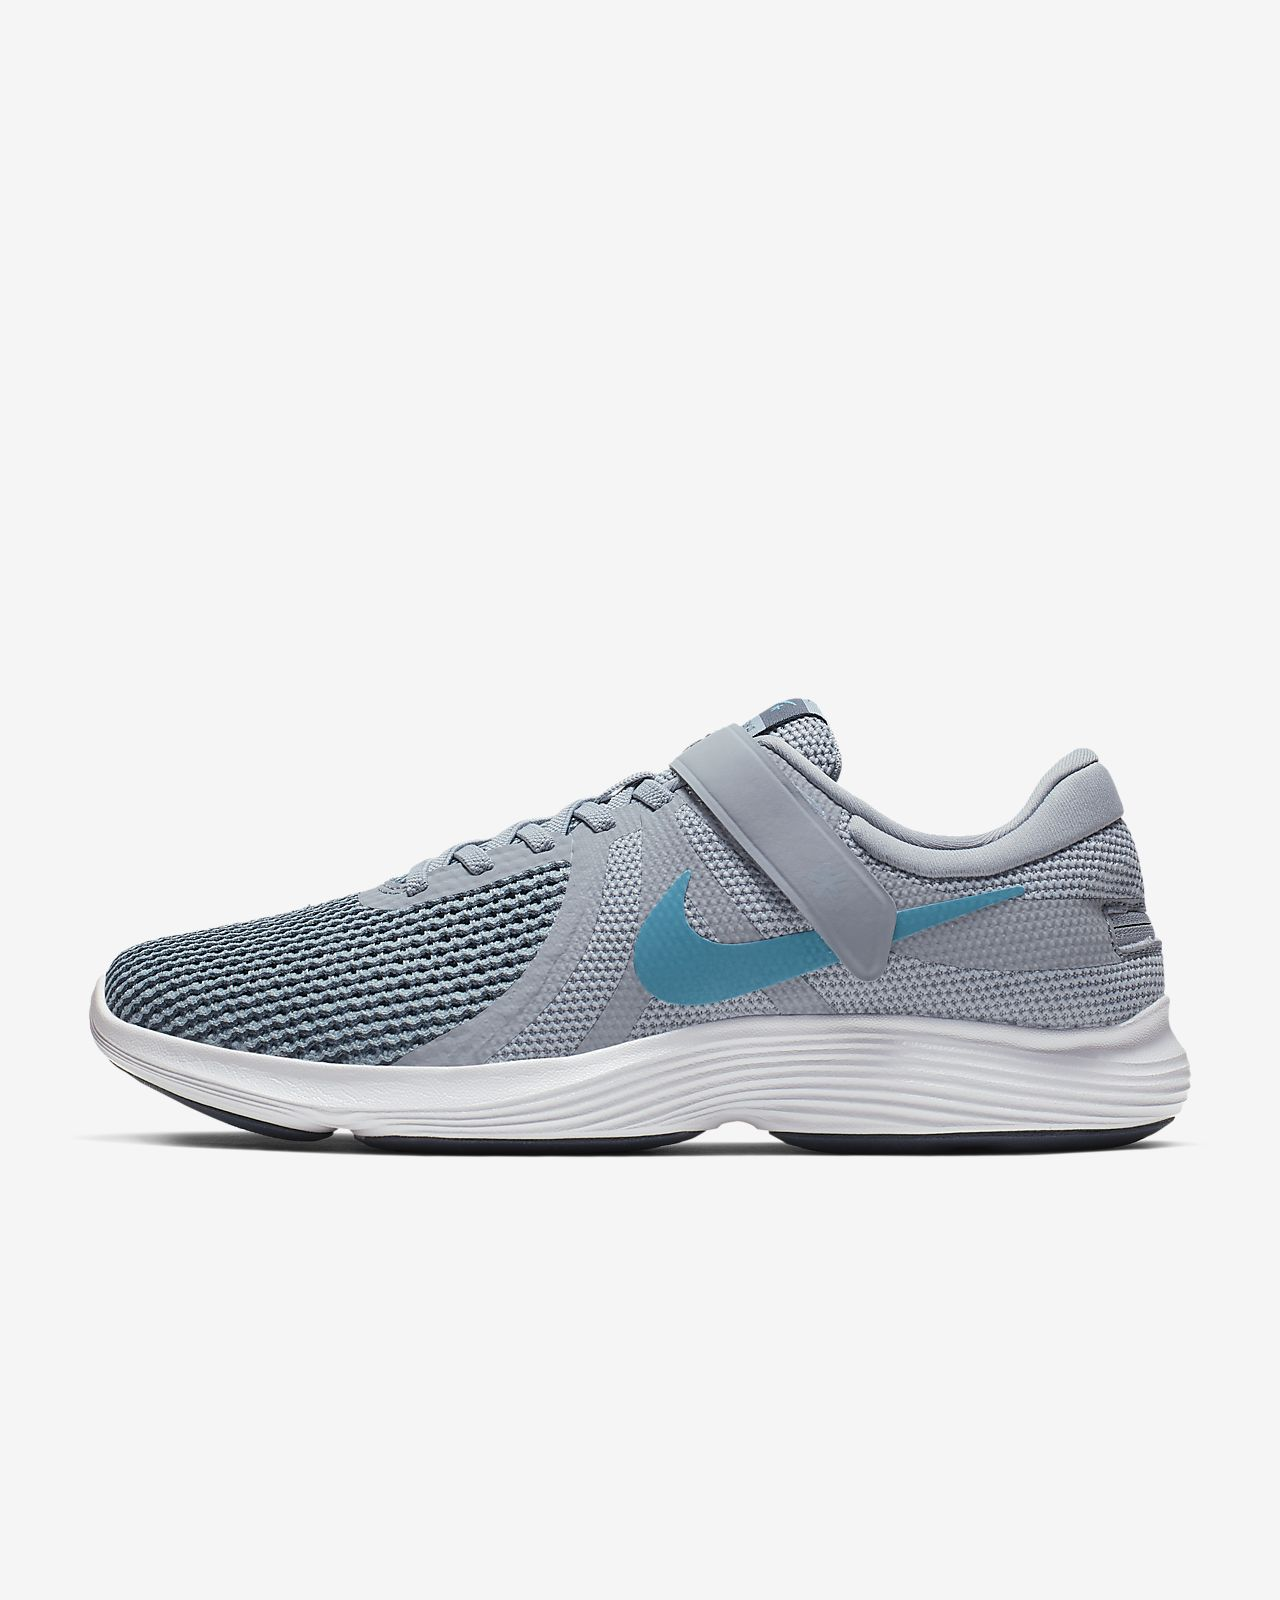 innovative design e6a05 eea62 ... Scarpa da running Nike Revolution 4 FlyEase - Uomo